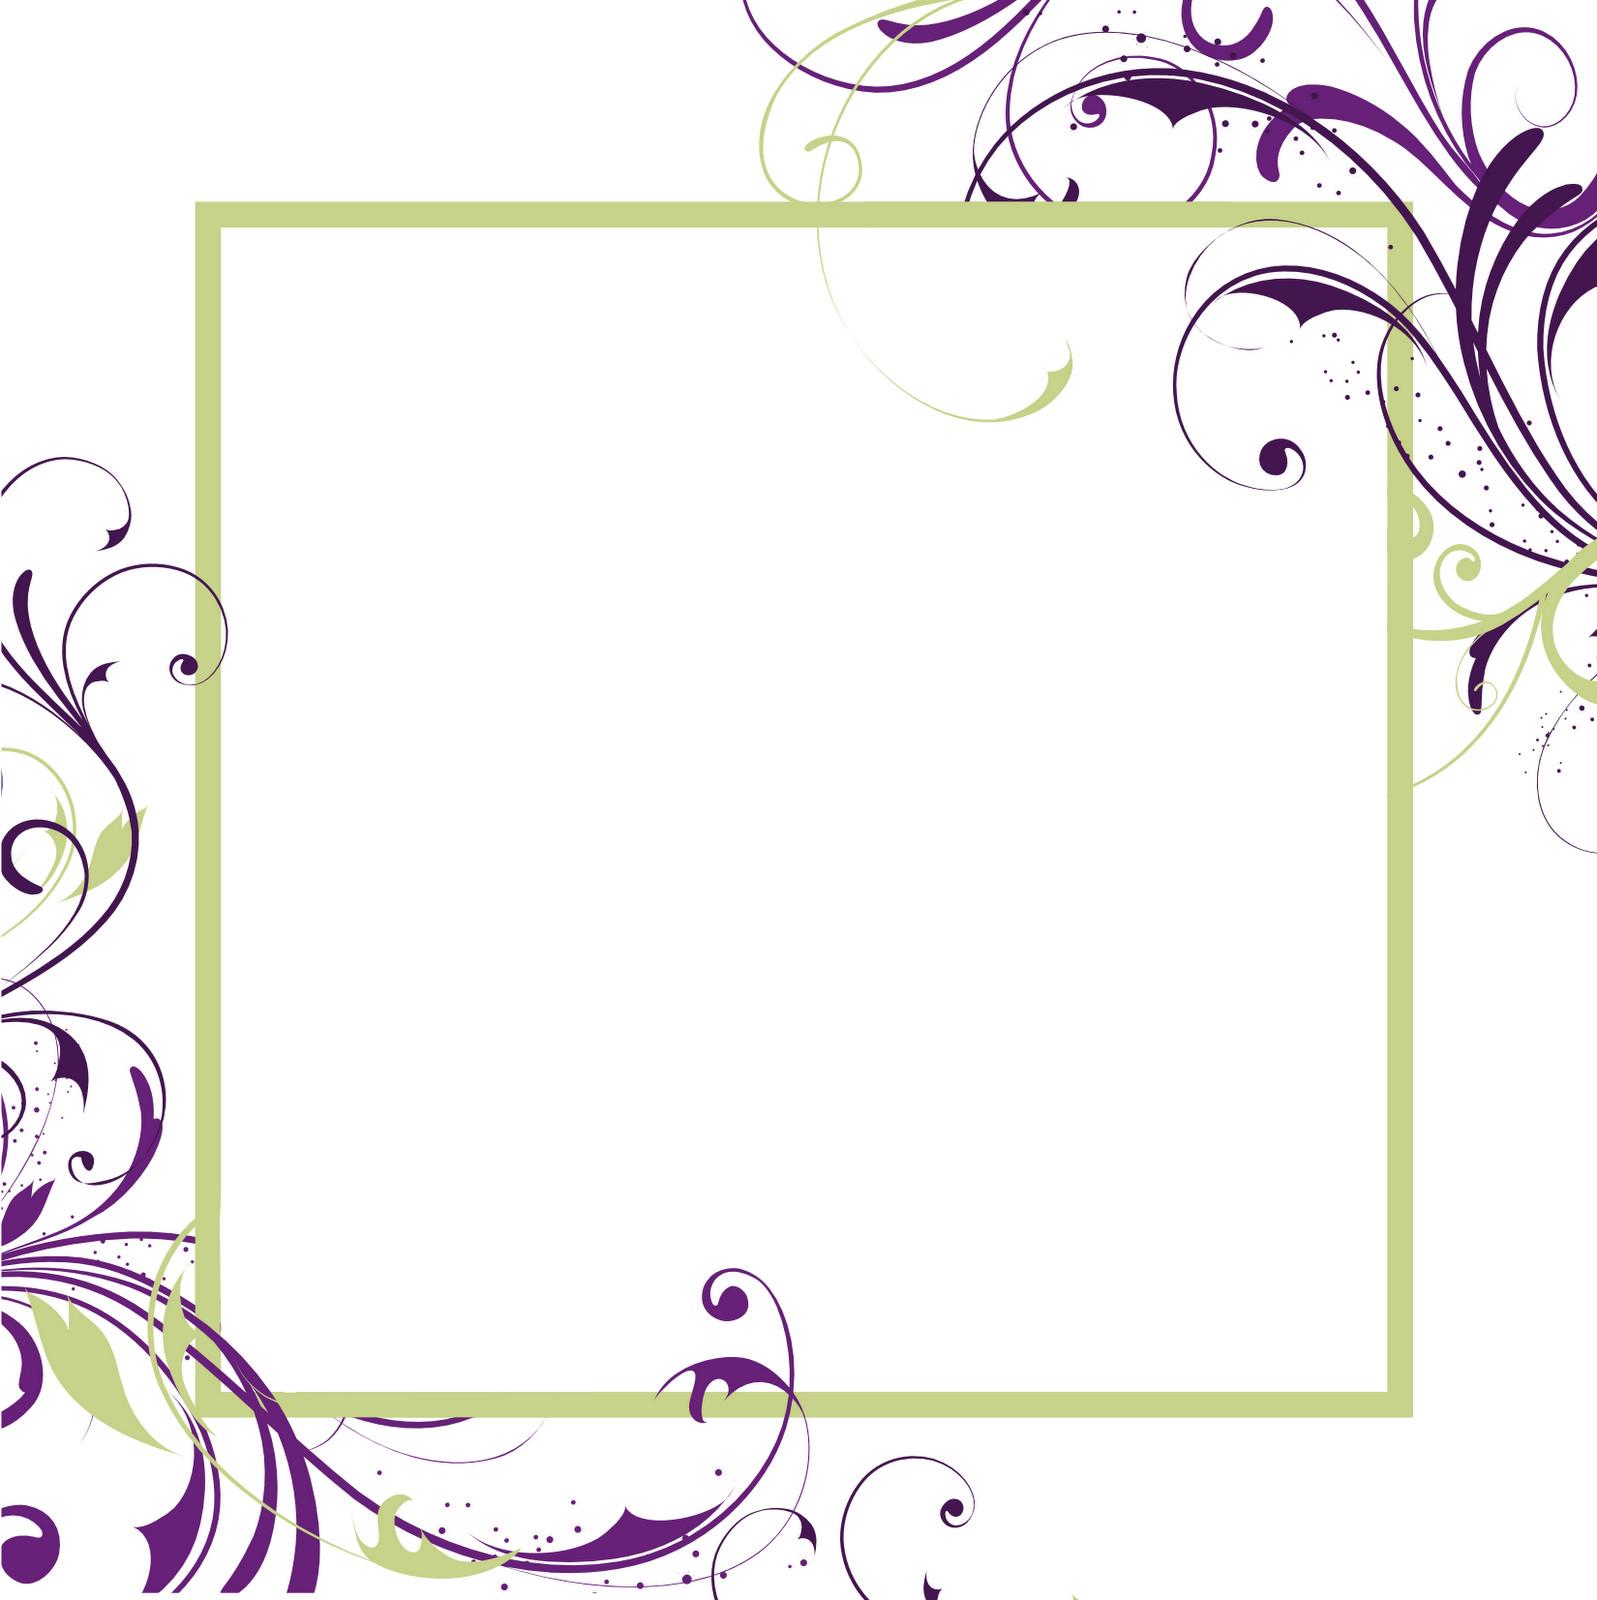 Free Blank Invitation Templates Free Printable Blank Invitations Templates